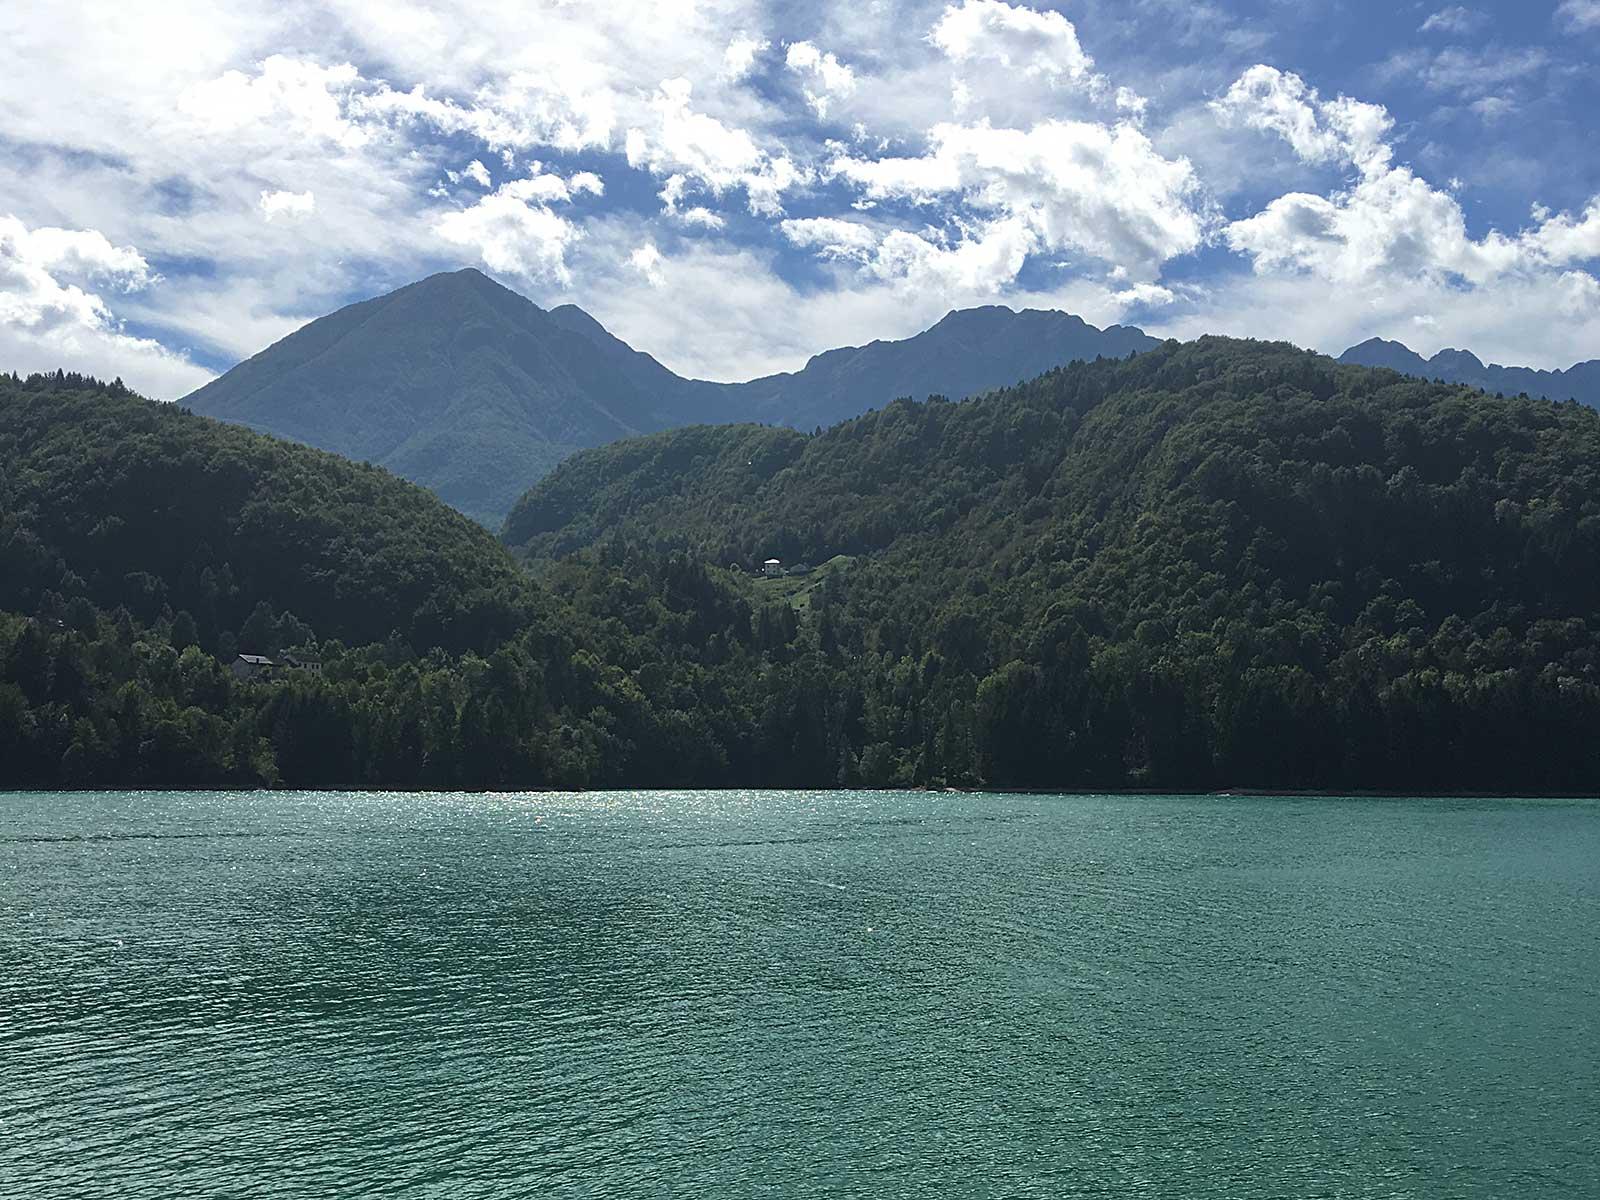 Barcis See | Lago di Barcis